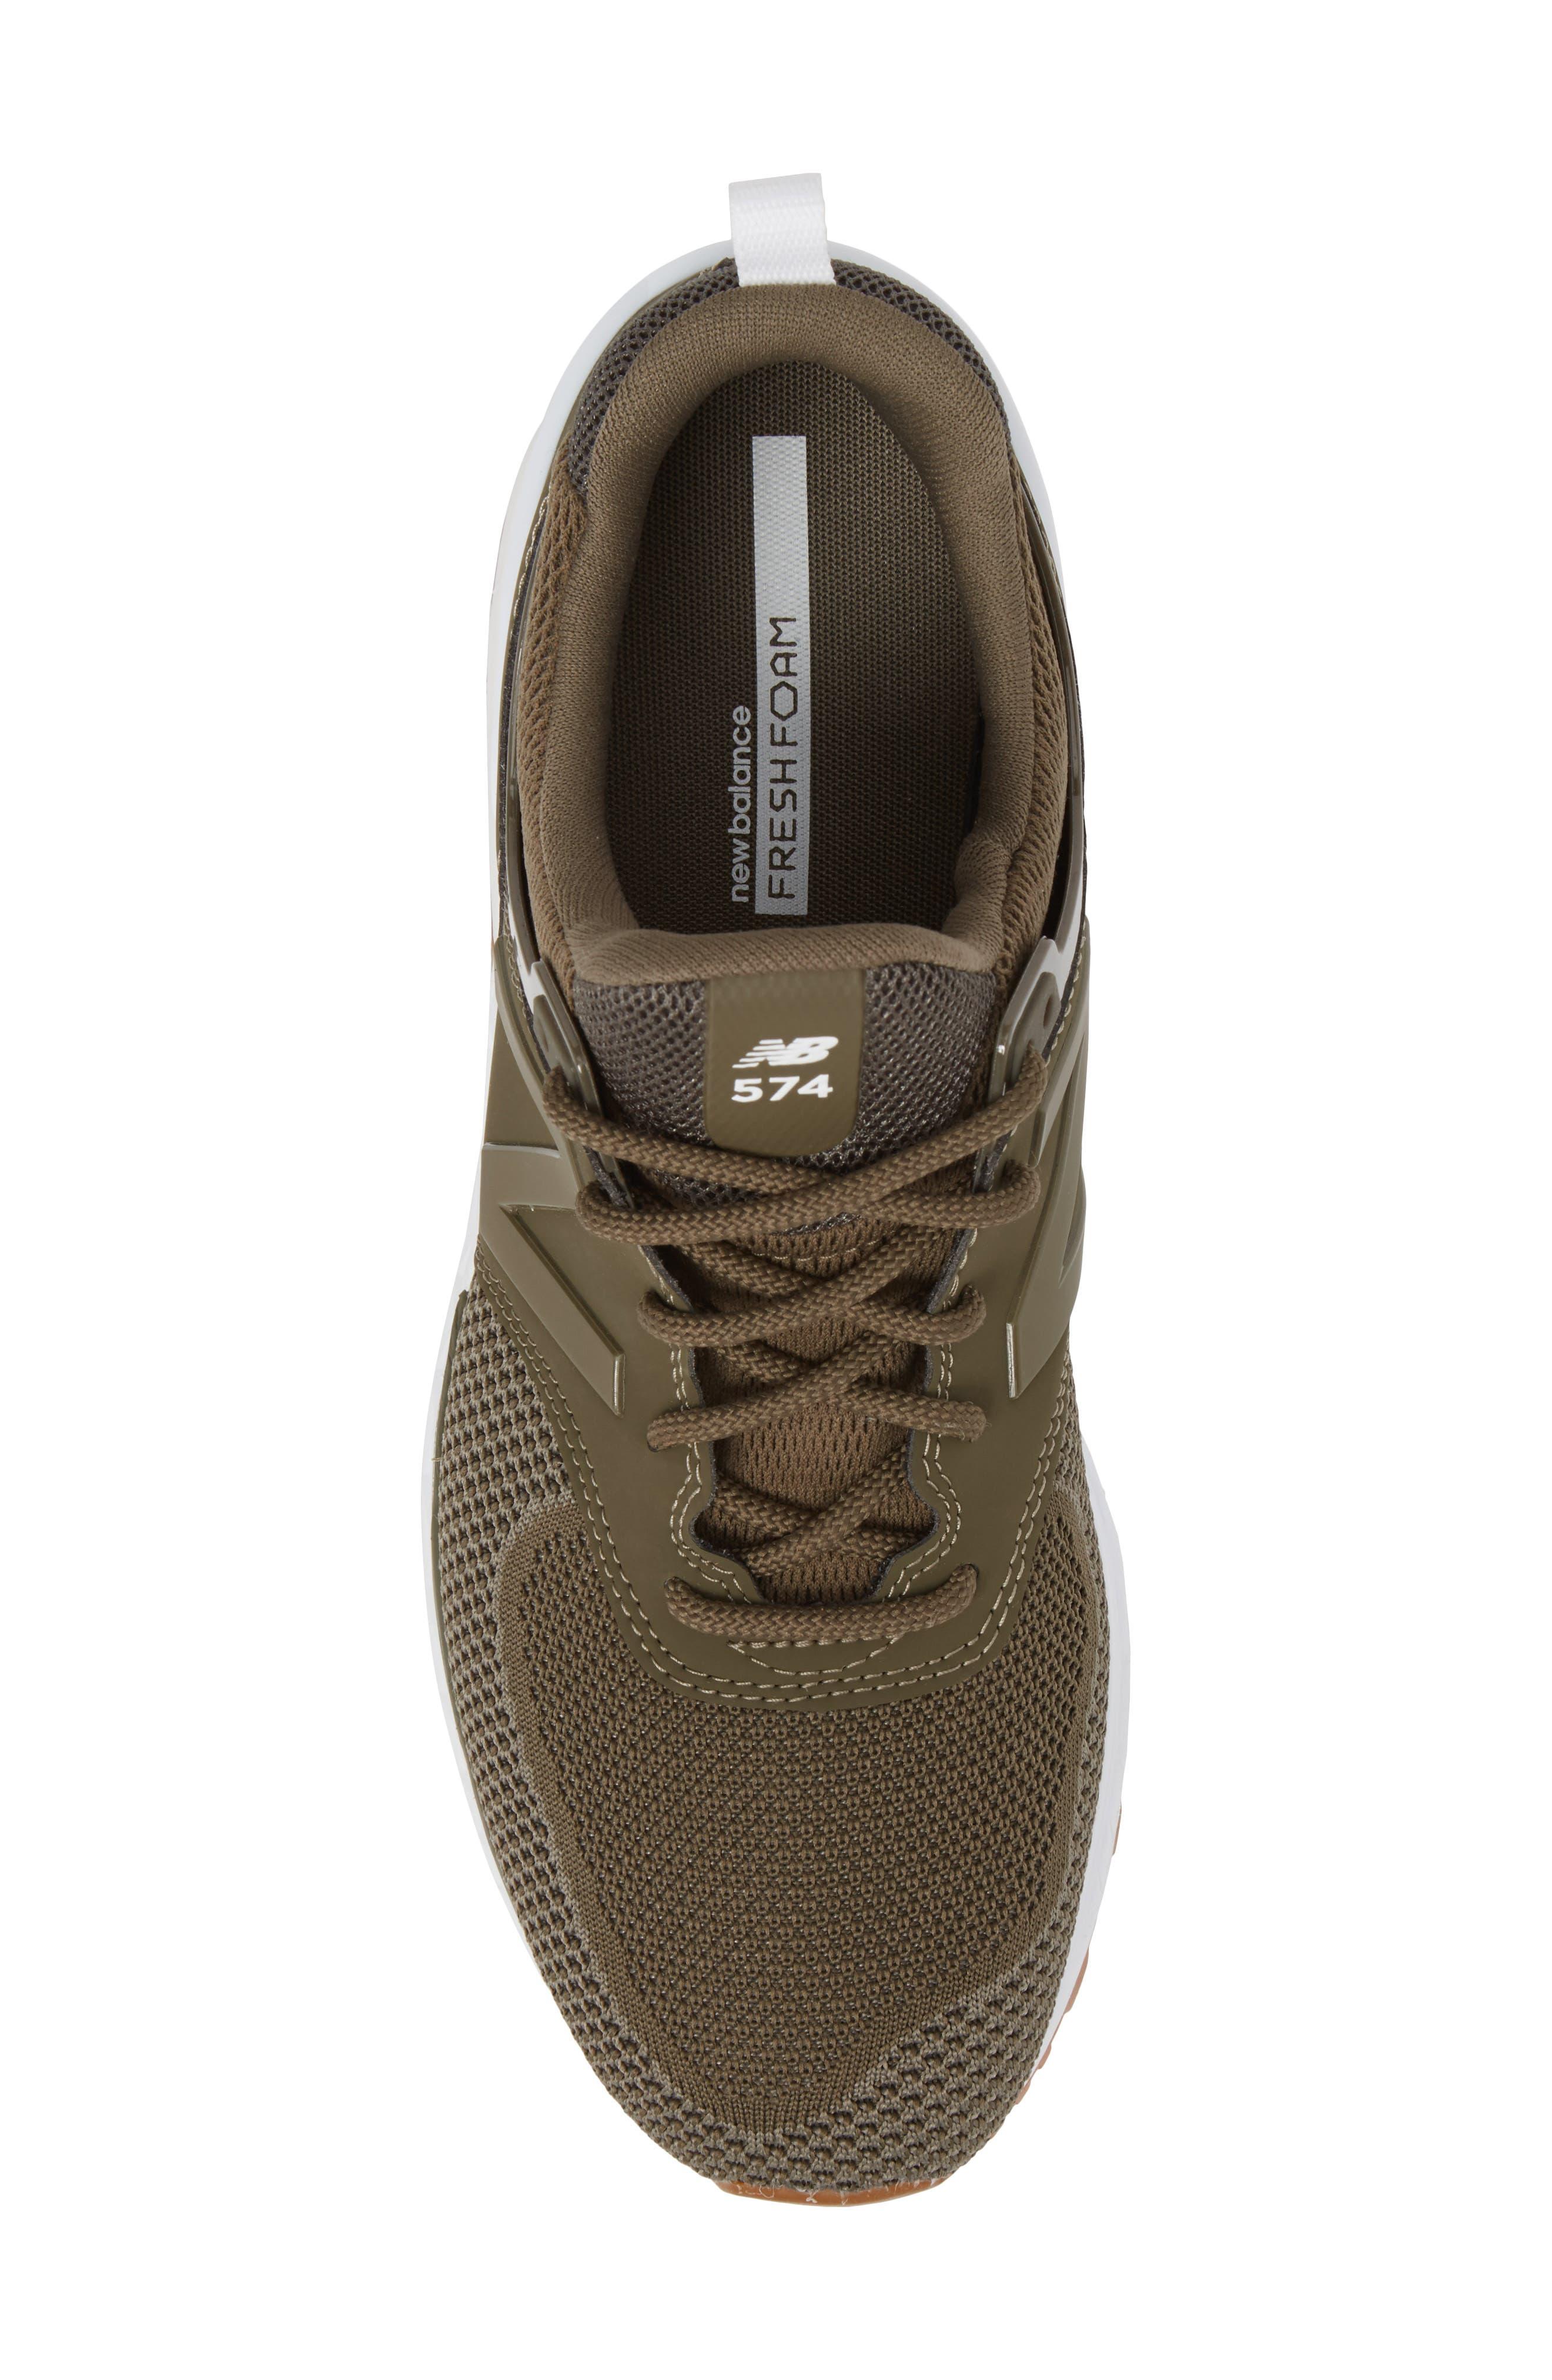 574 Engineered Mesh Sneaker,                             Alternate thumbnail 5, color,                             338